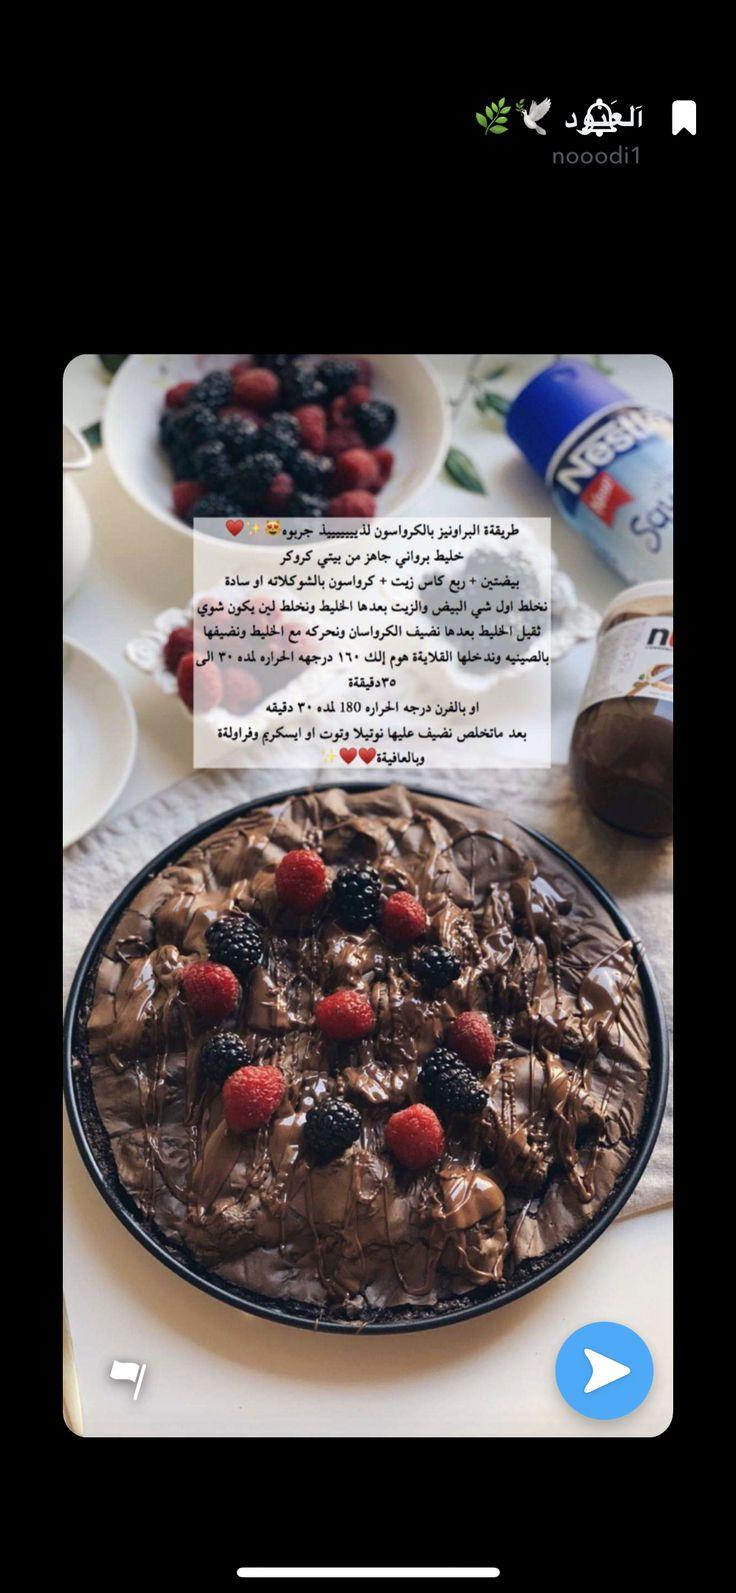 Pin By Nouf M Aldhaiem On Food Food Arabic Food Food And Drink